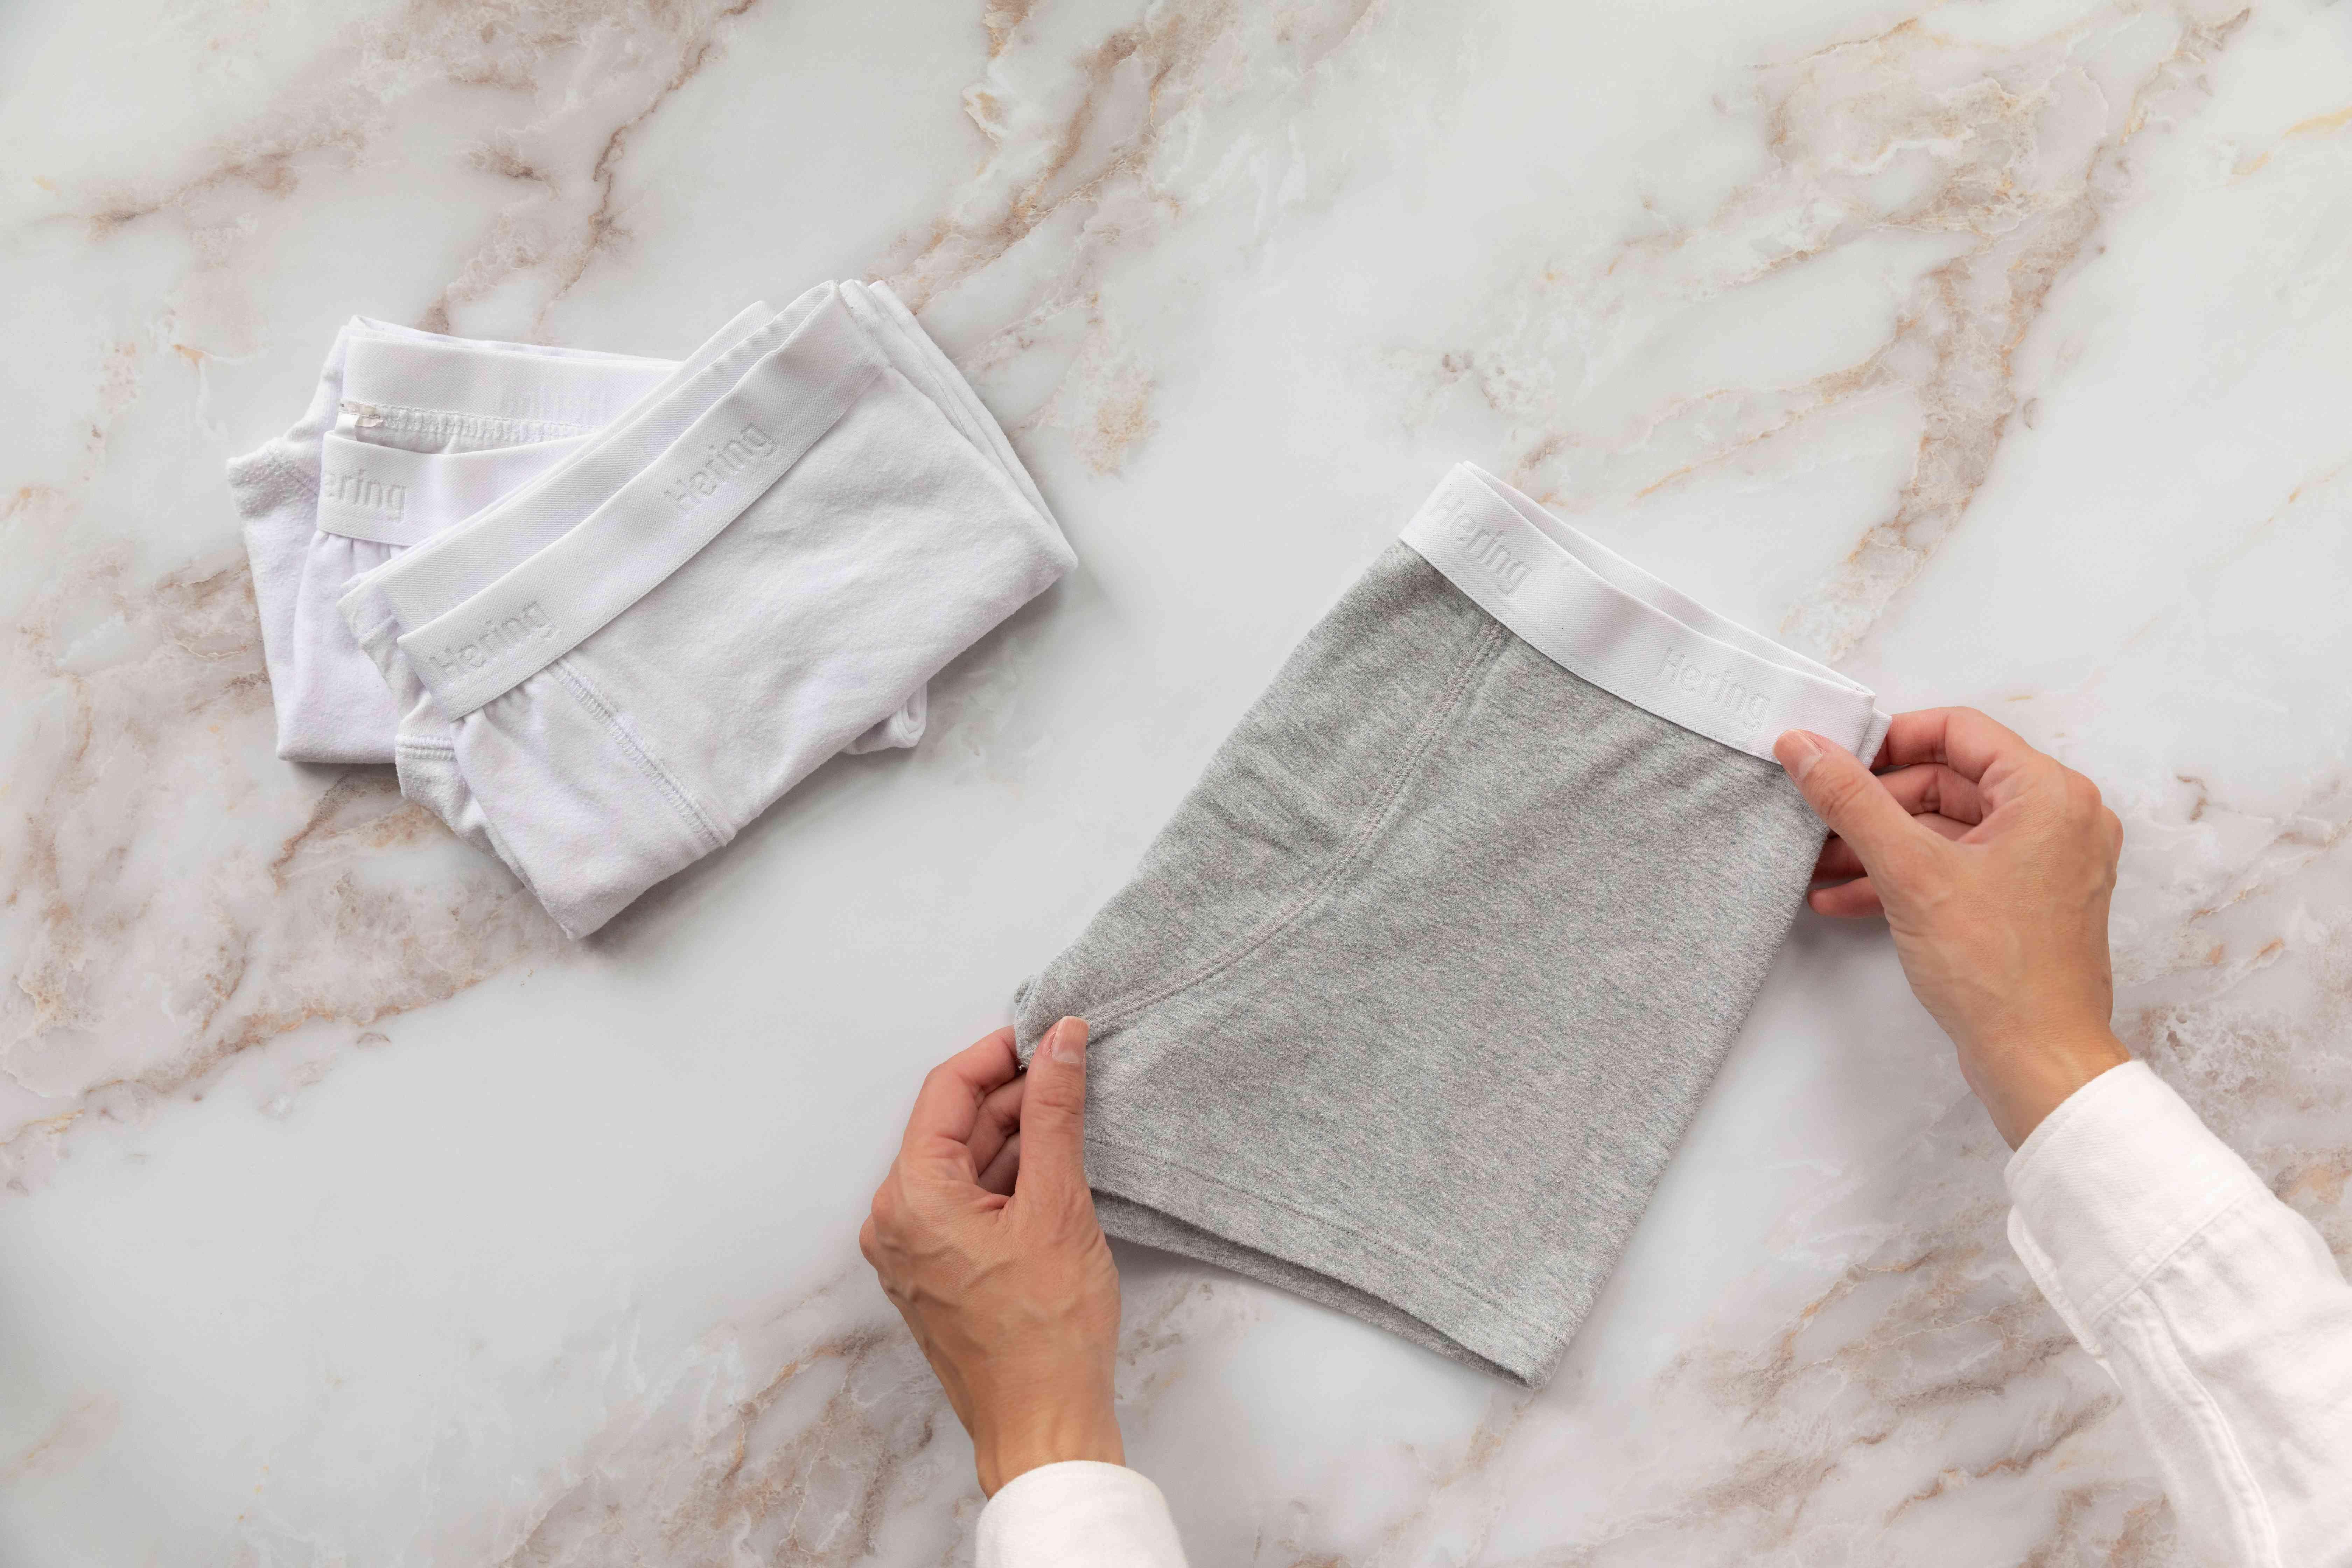 Gray underwear folded vertically in half next to stack of folded white underwear